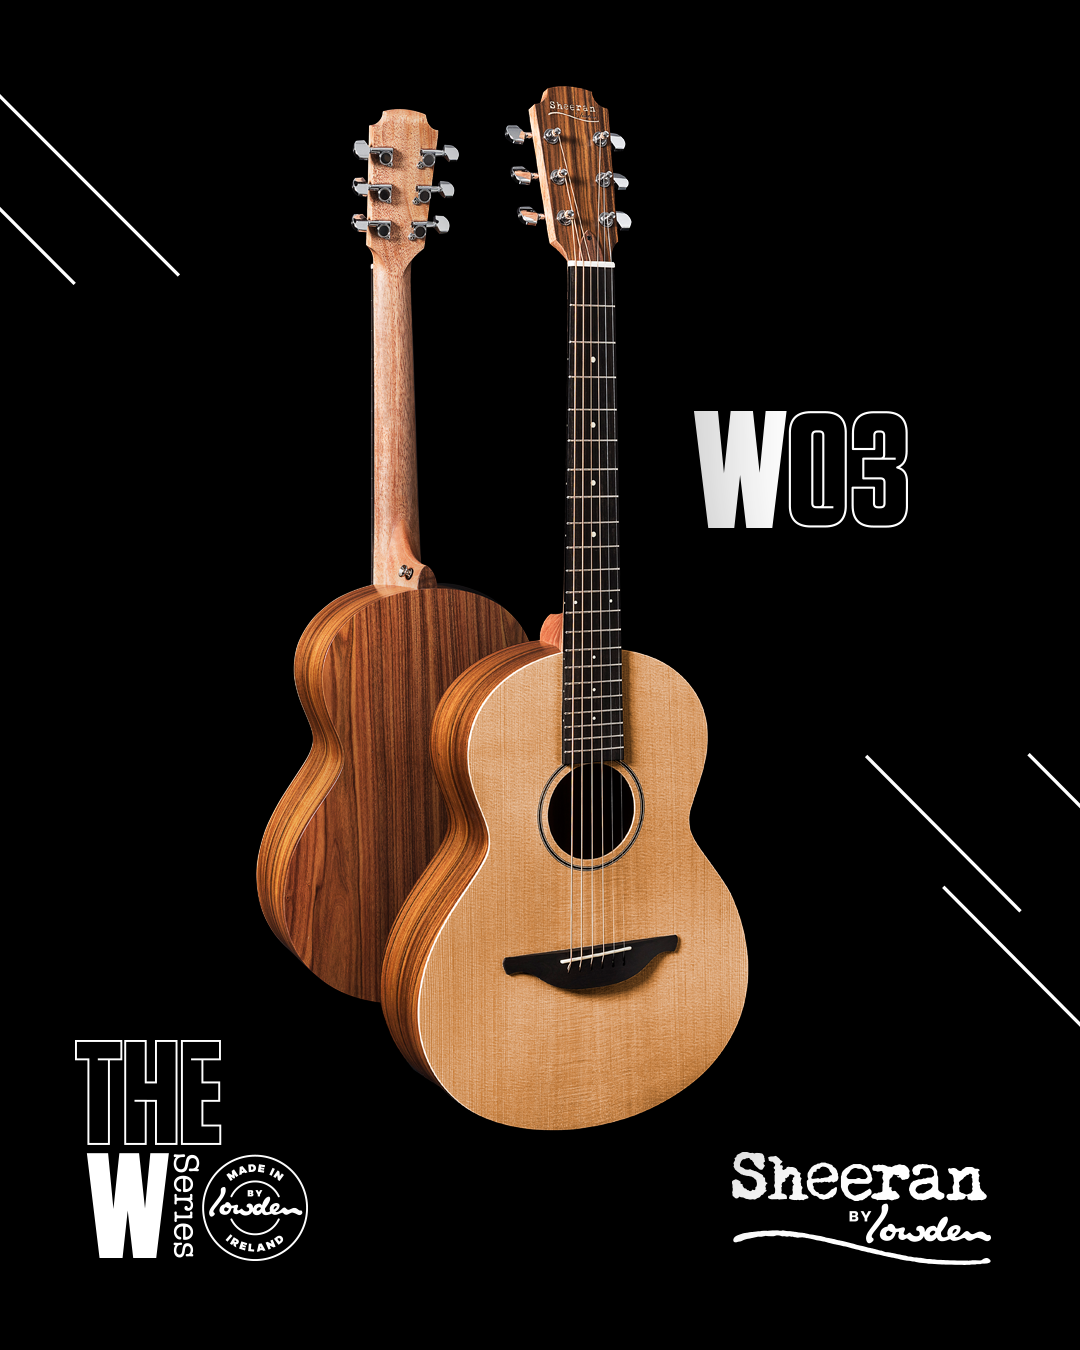 Sheeran by Lowden W-03 Cedar/Rosewood Guitar w/ LR Baggs Pickup (PRE ORDER)